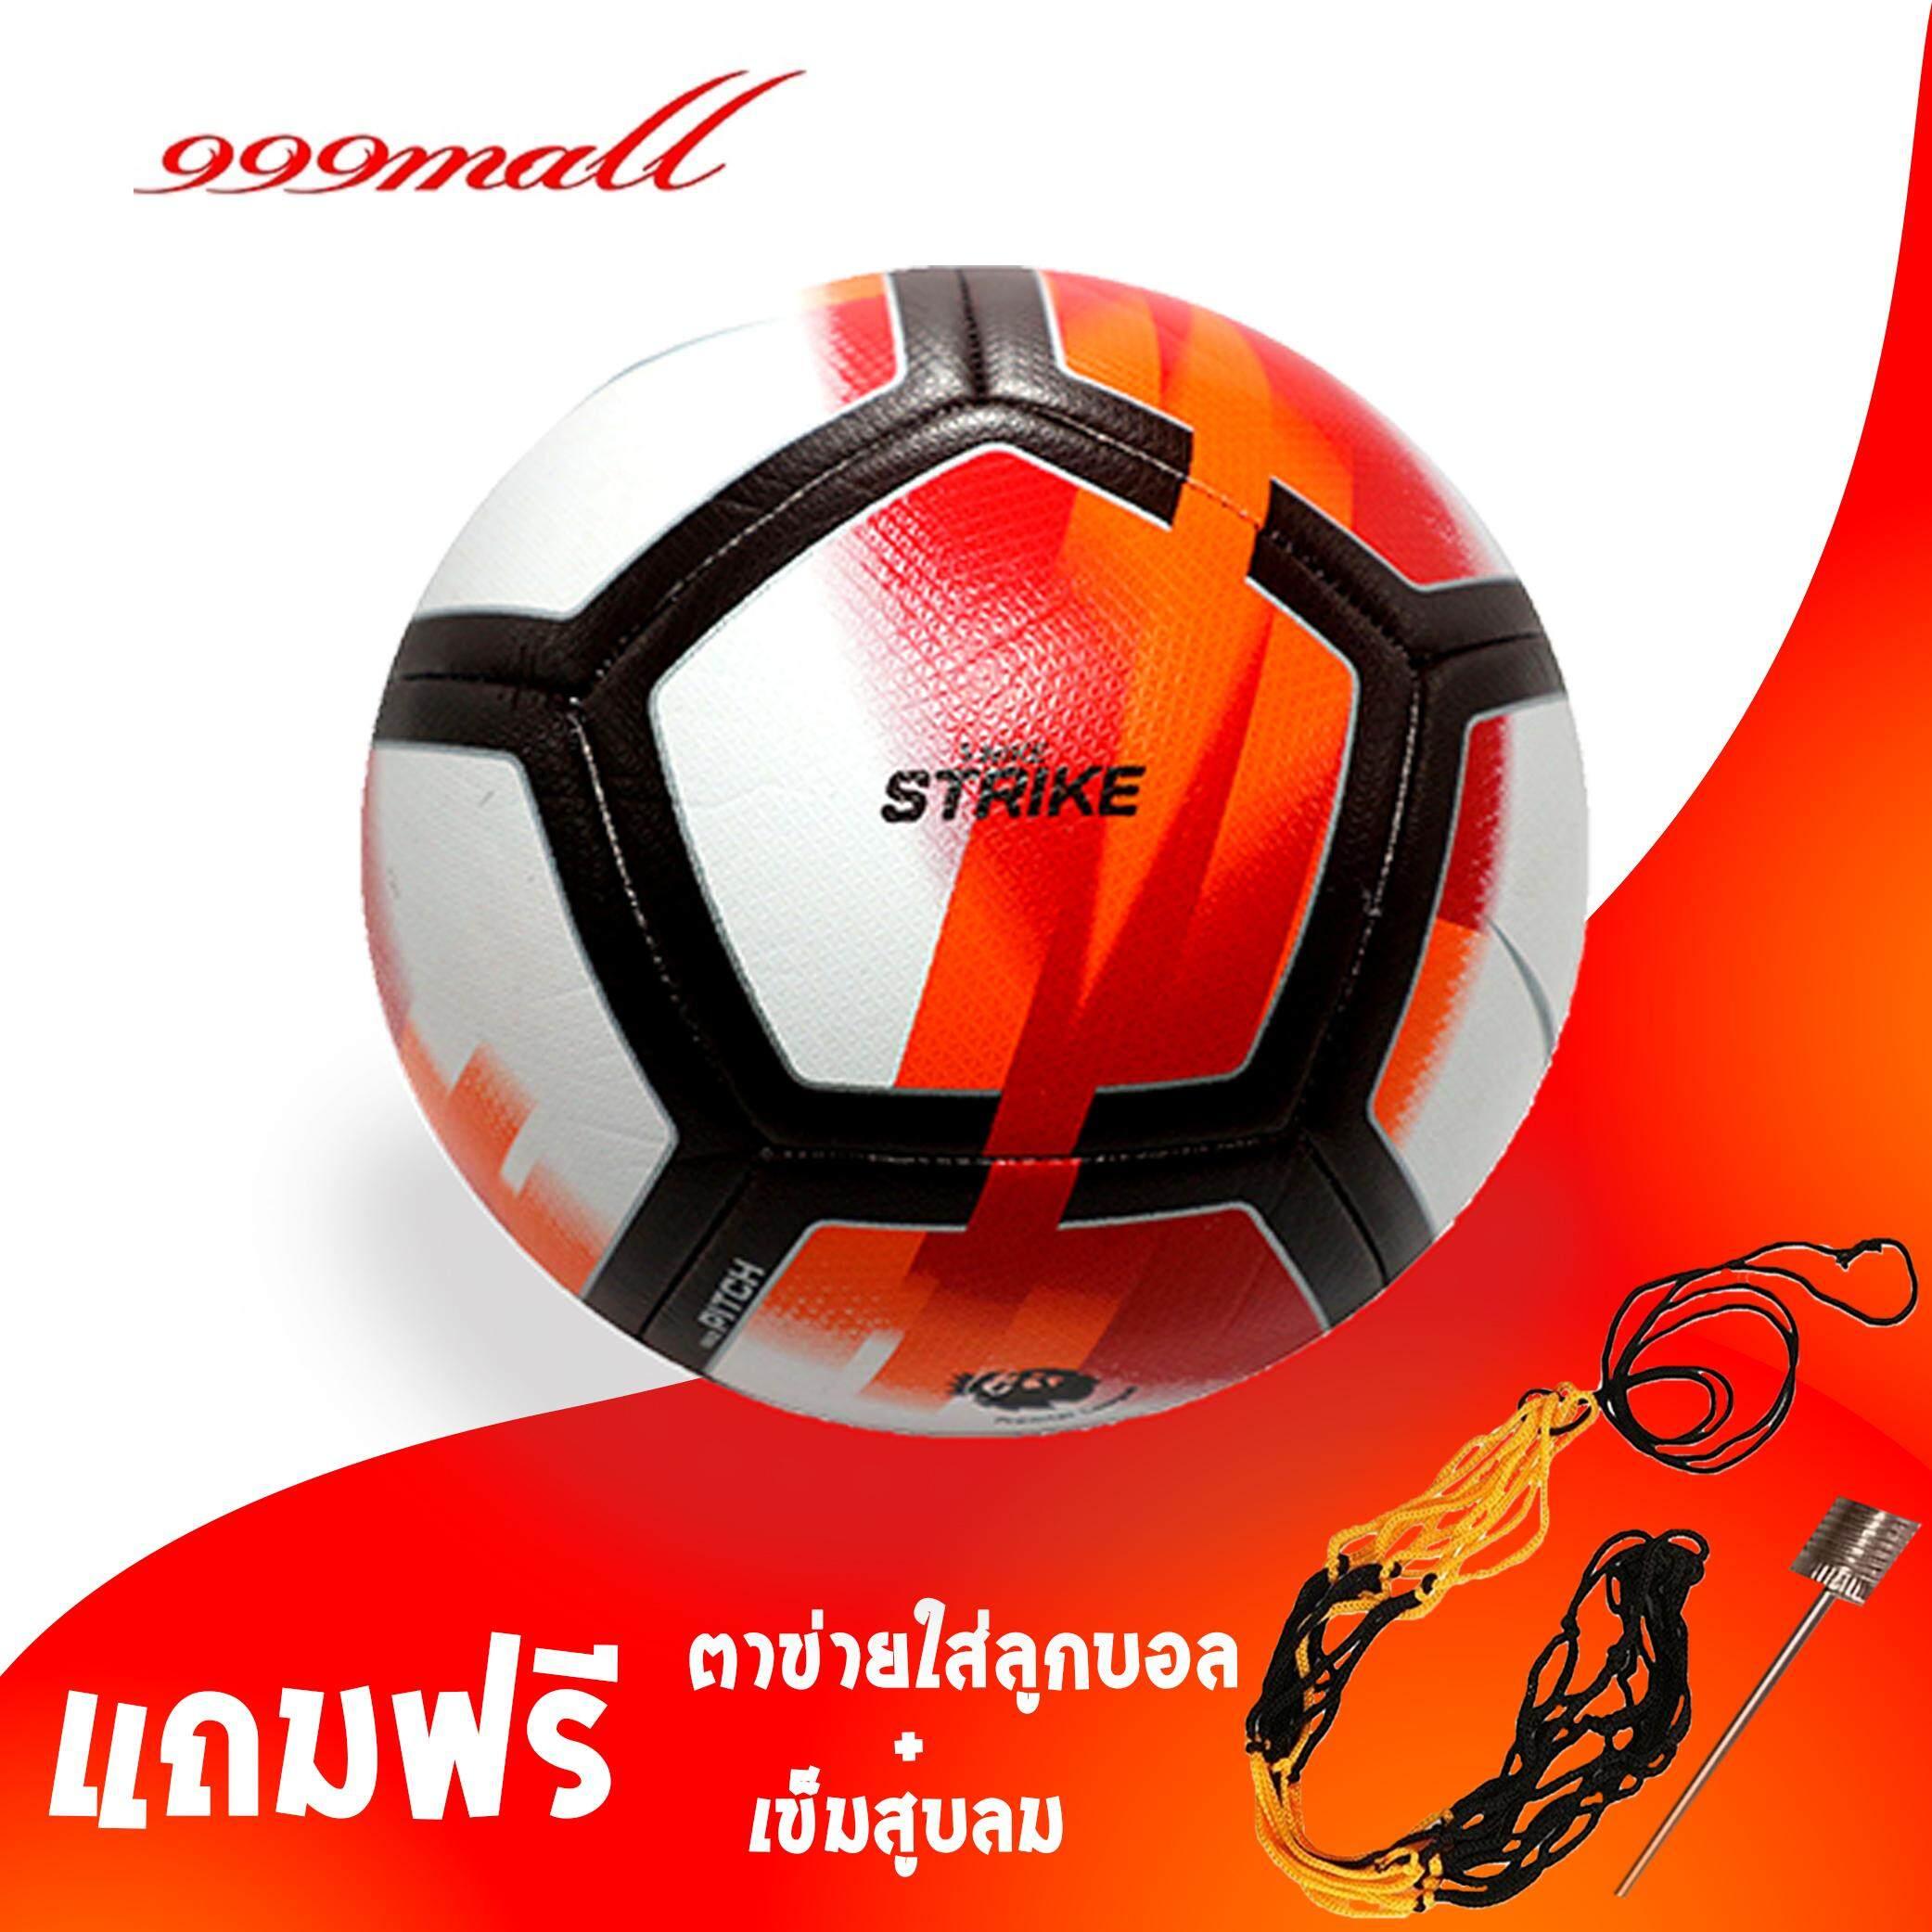 Football ลูกฟุตบอล ฟุตบอล หนัง football เบอร์ 5 หนังเย็บ PVC รุ่น W2แถมฟรี ตาข่ายใส่ลูกบอล+เข็มสูบลม 2 ชิ้น